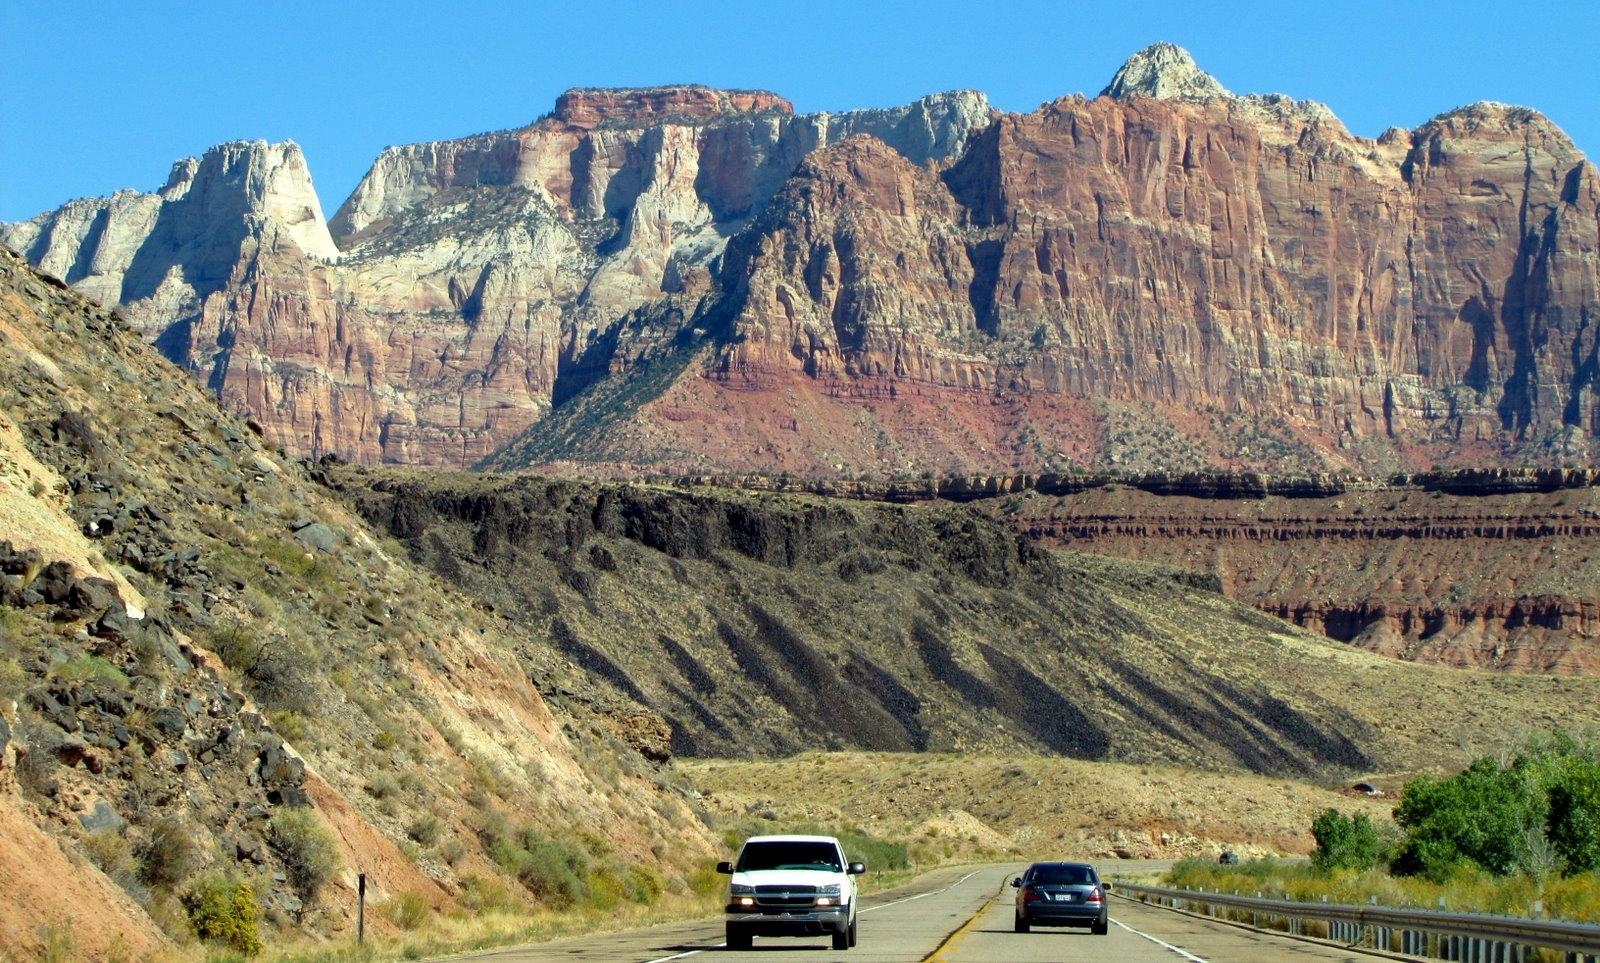 Átlagos út átlagos tájjal Utahban  Average view on a highway in Utah